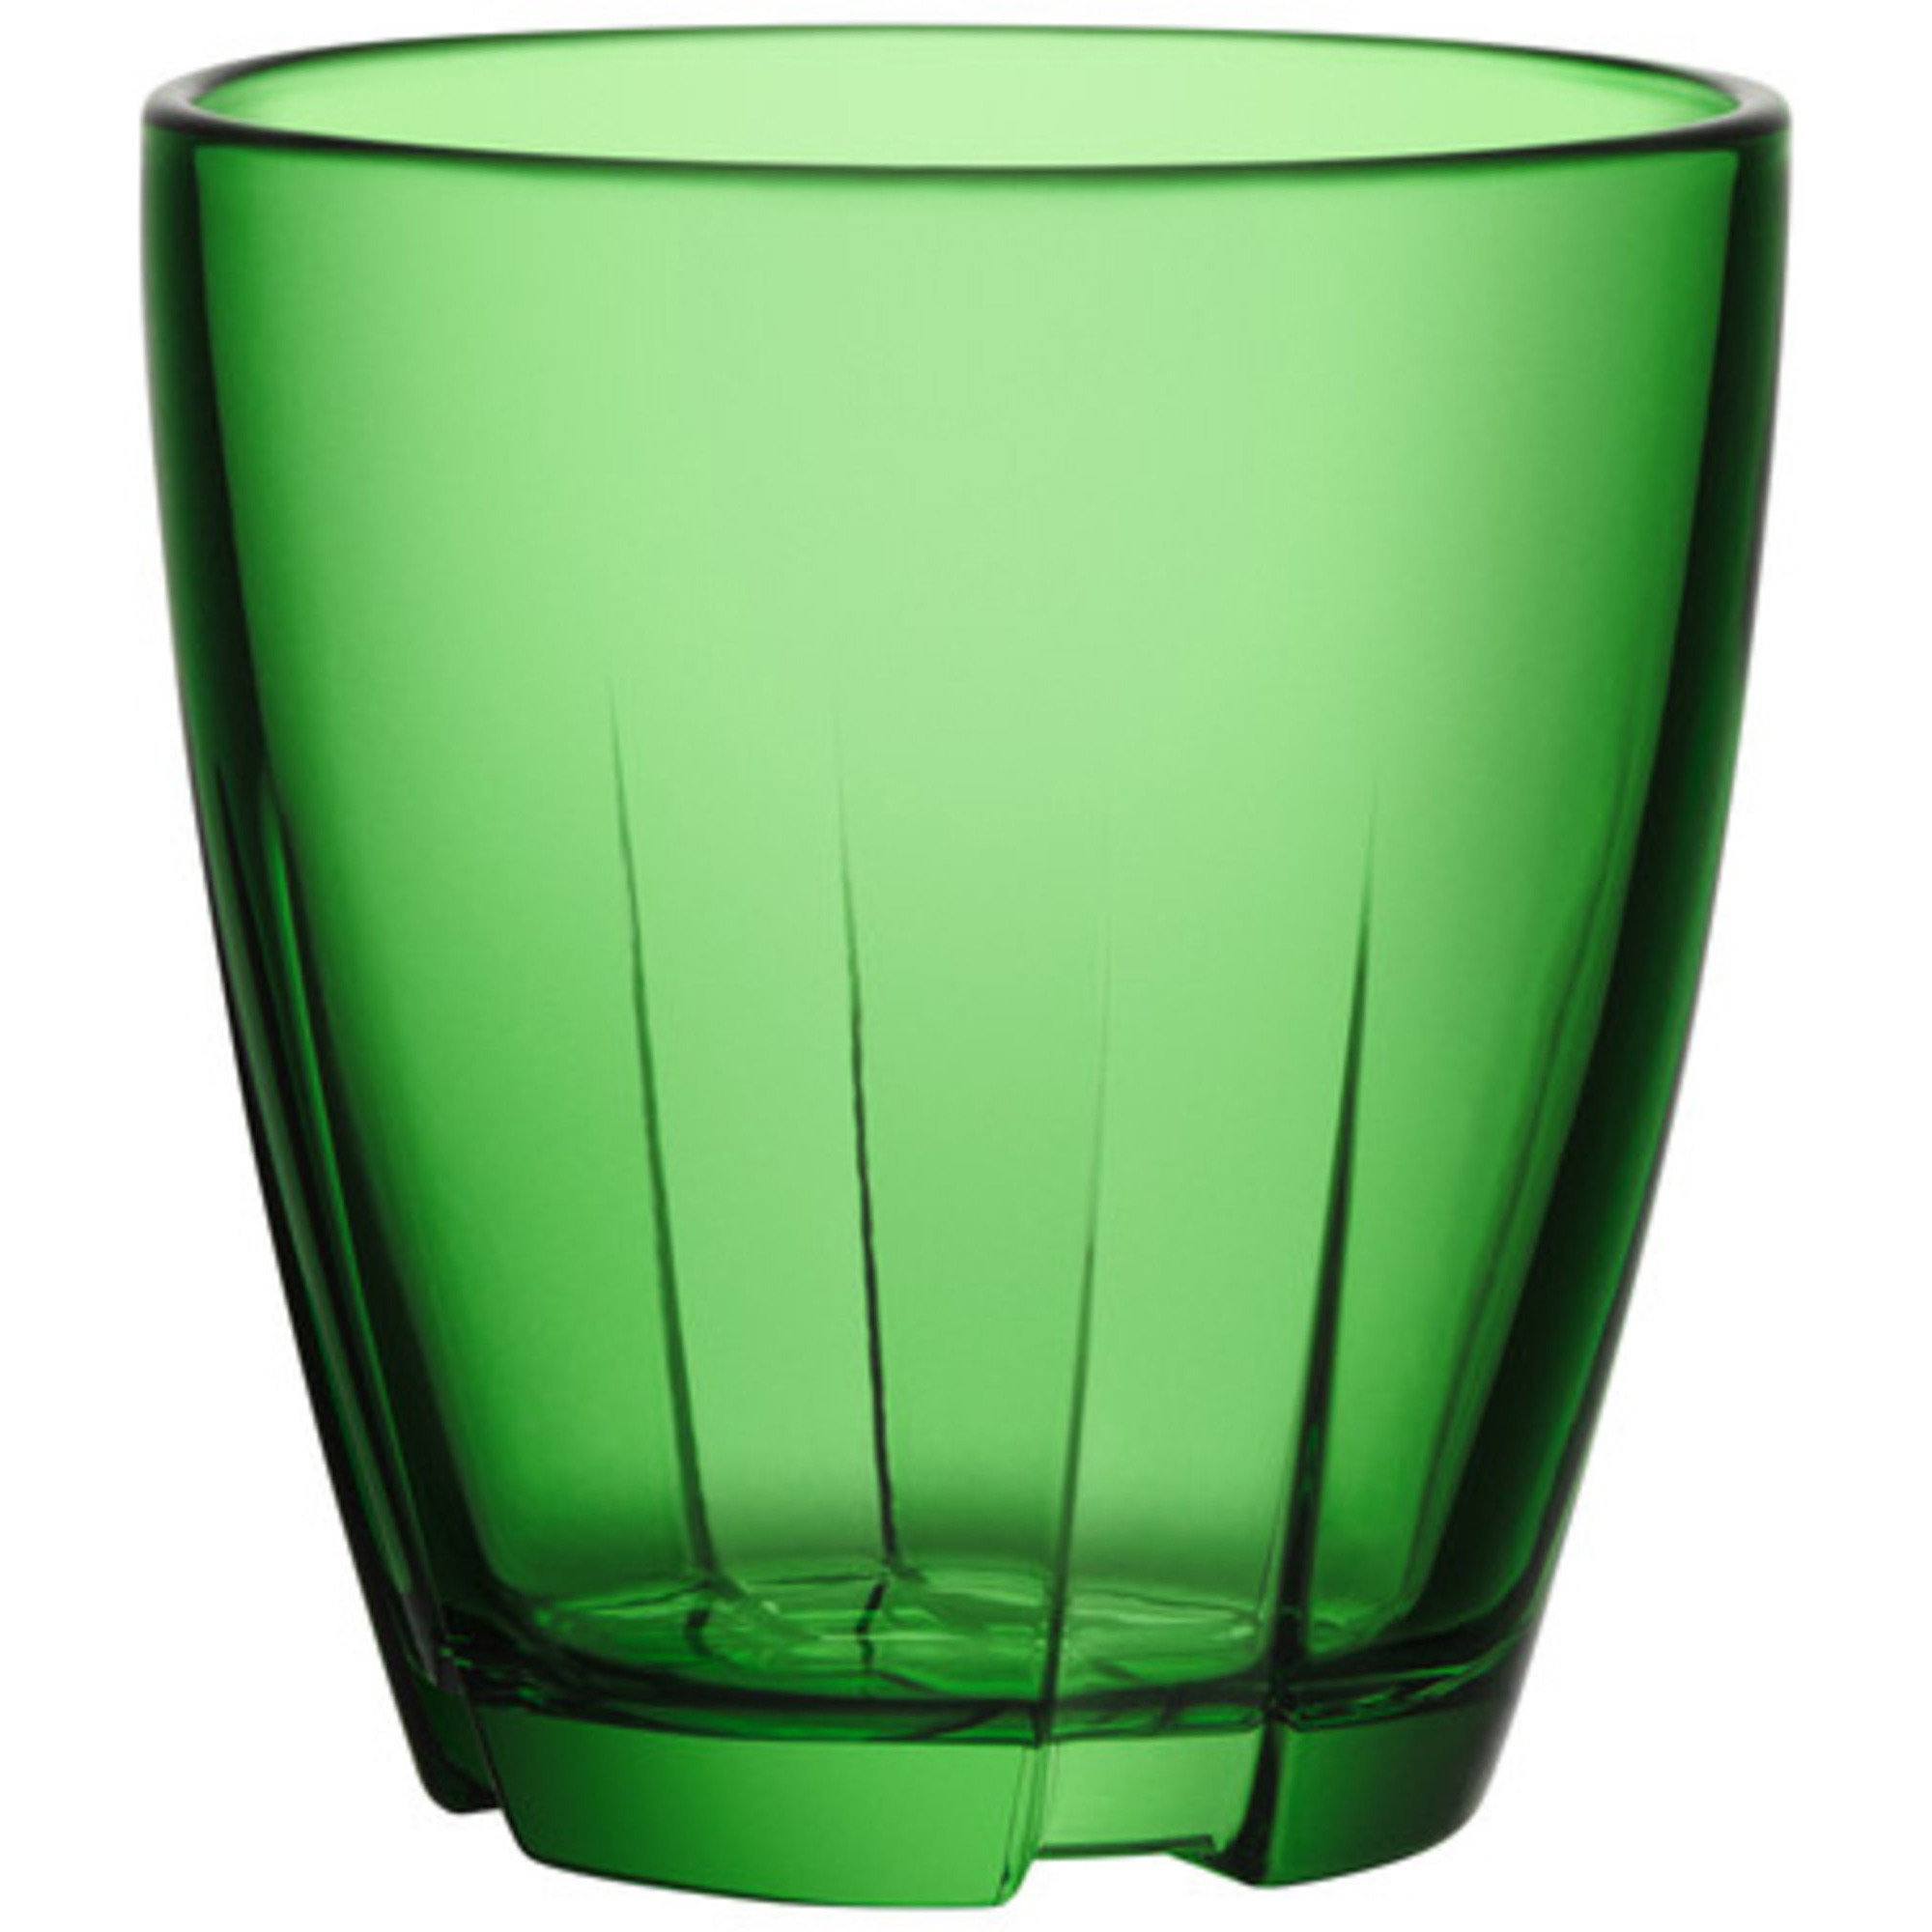 Kosta Boda Bruk Tumblerglas Grön Litet